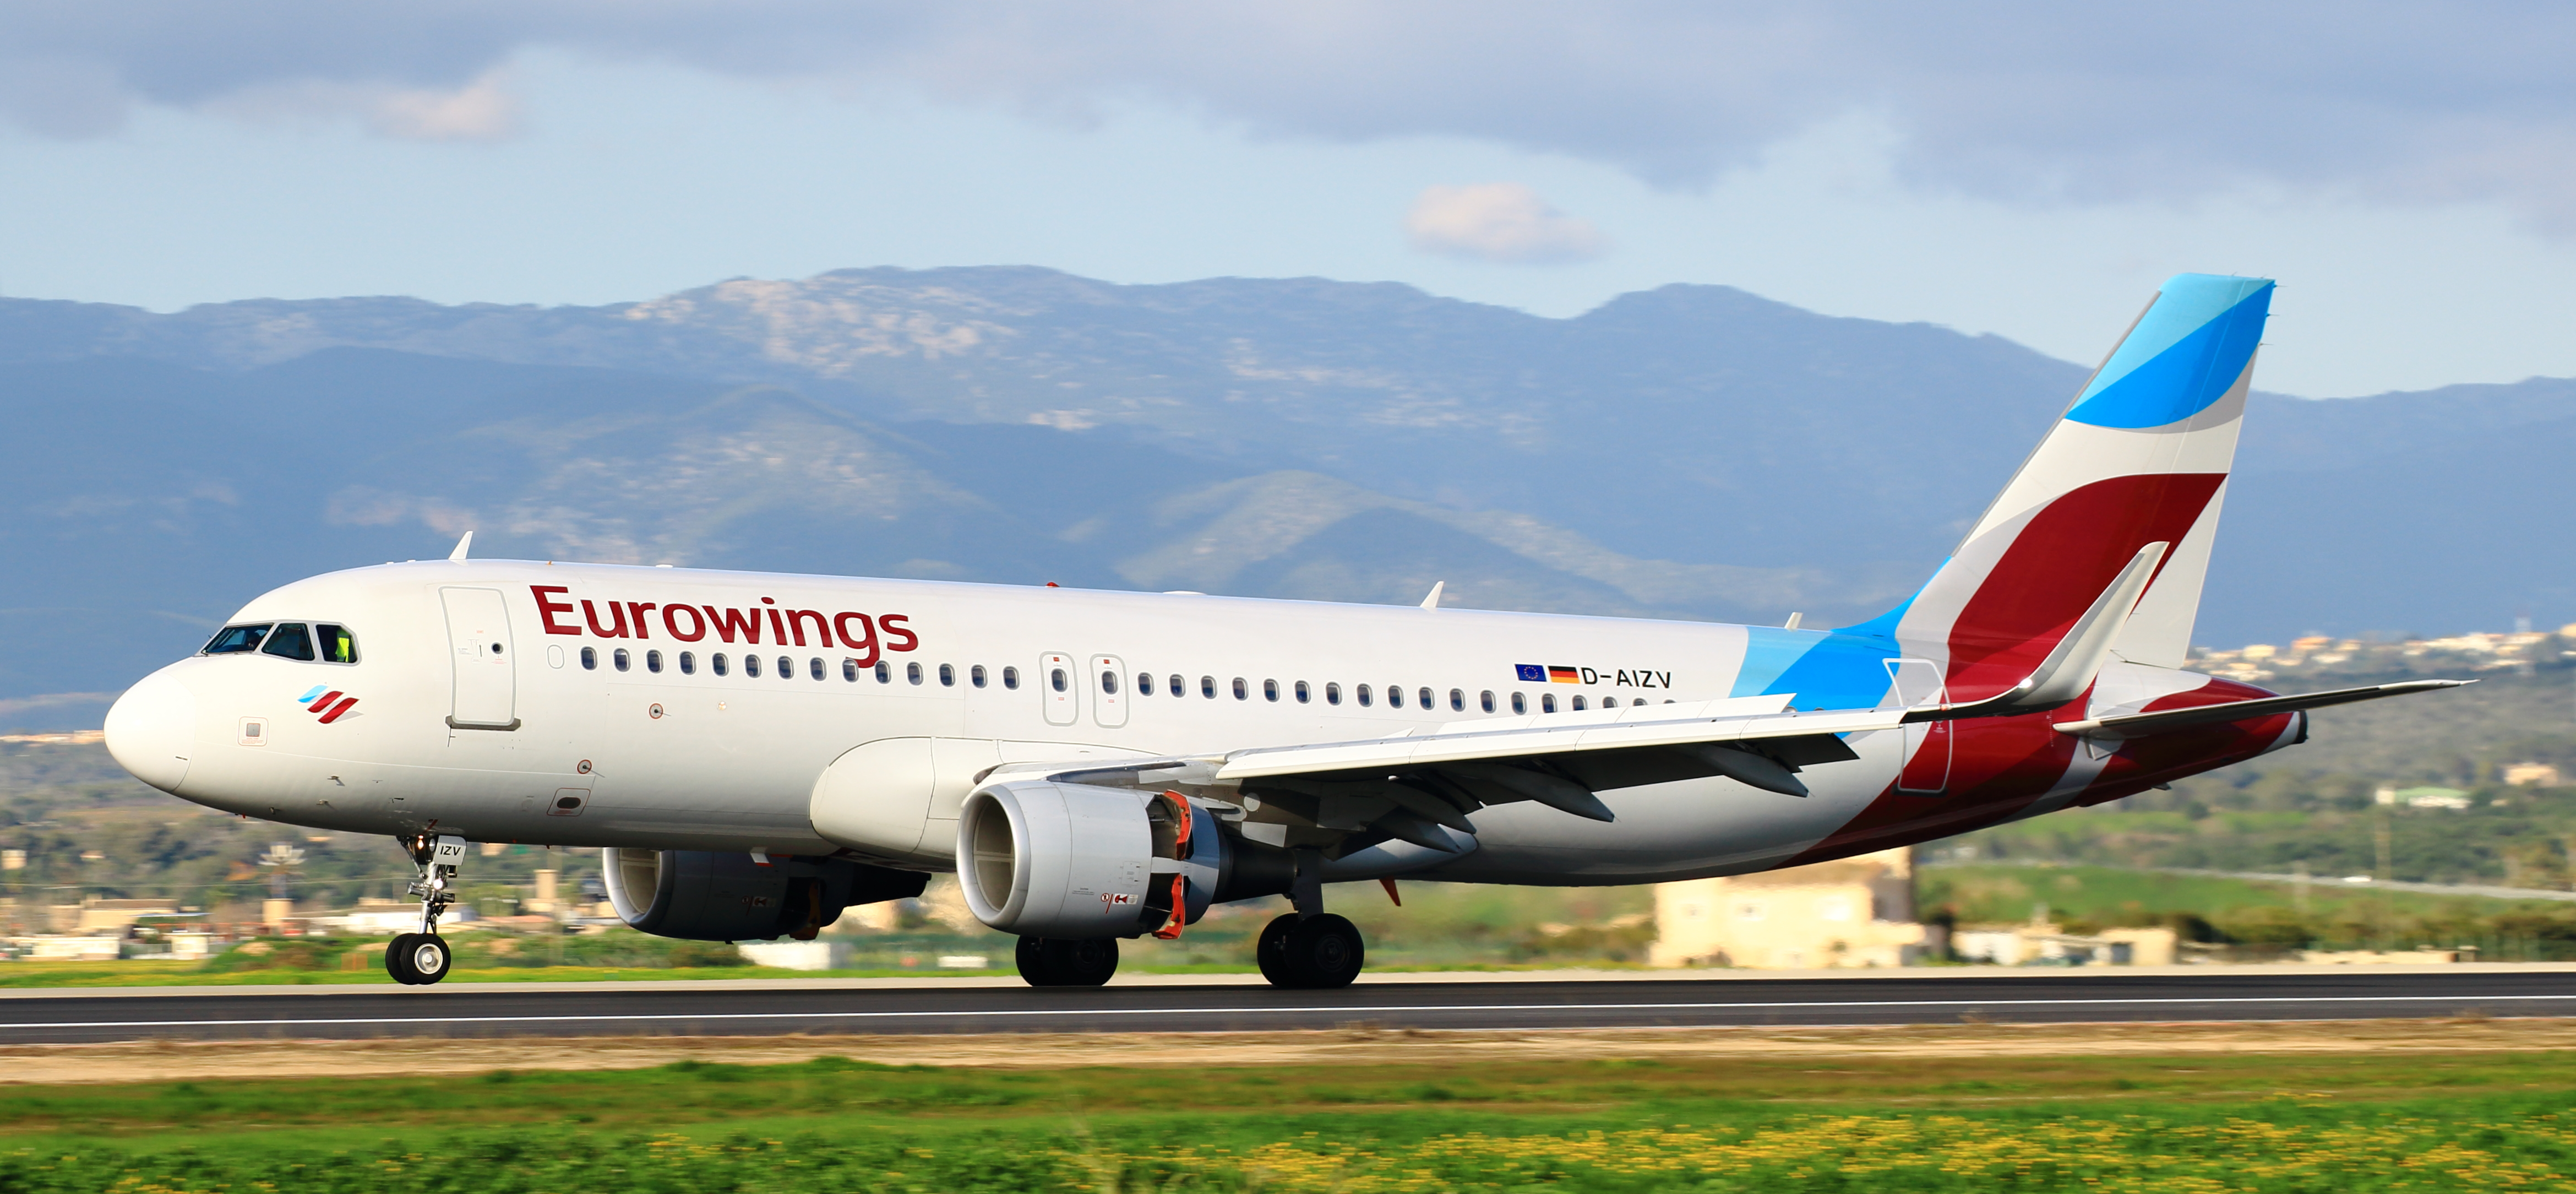 Et Airbus A320-fly fra Eurowings. Foto: Lasse B.